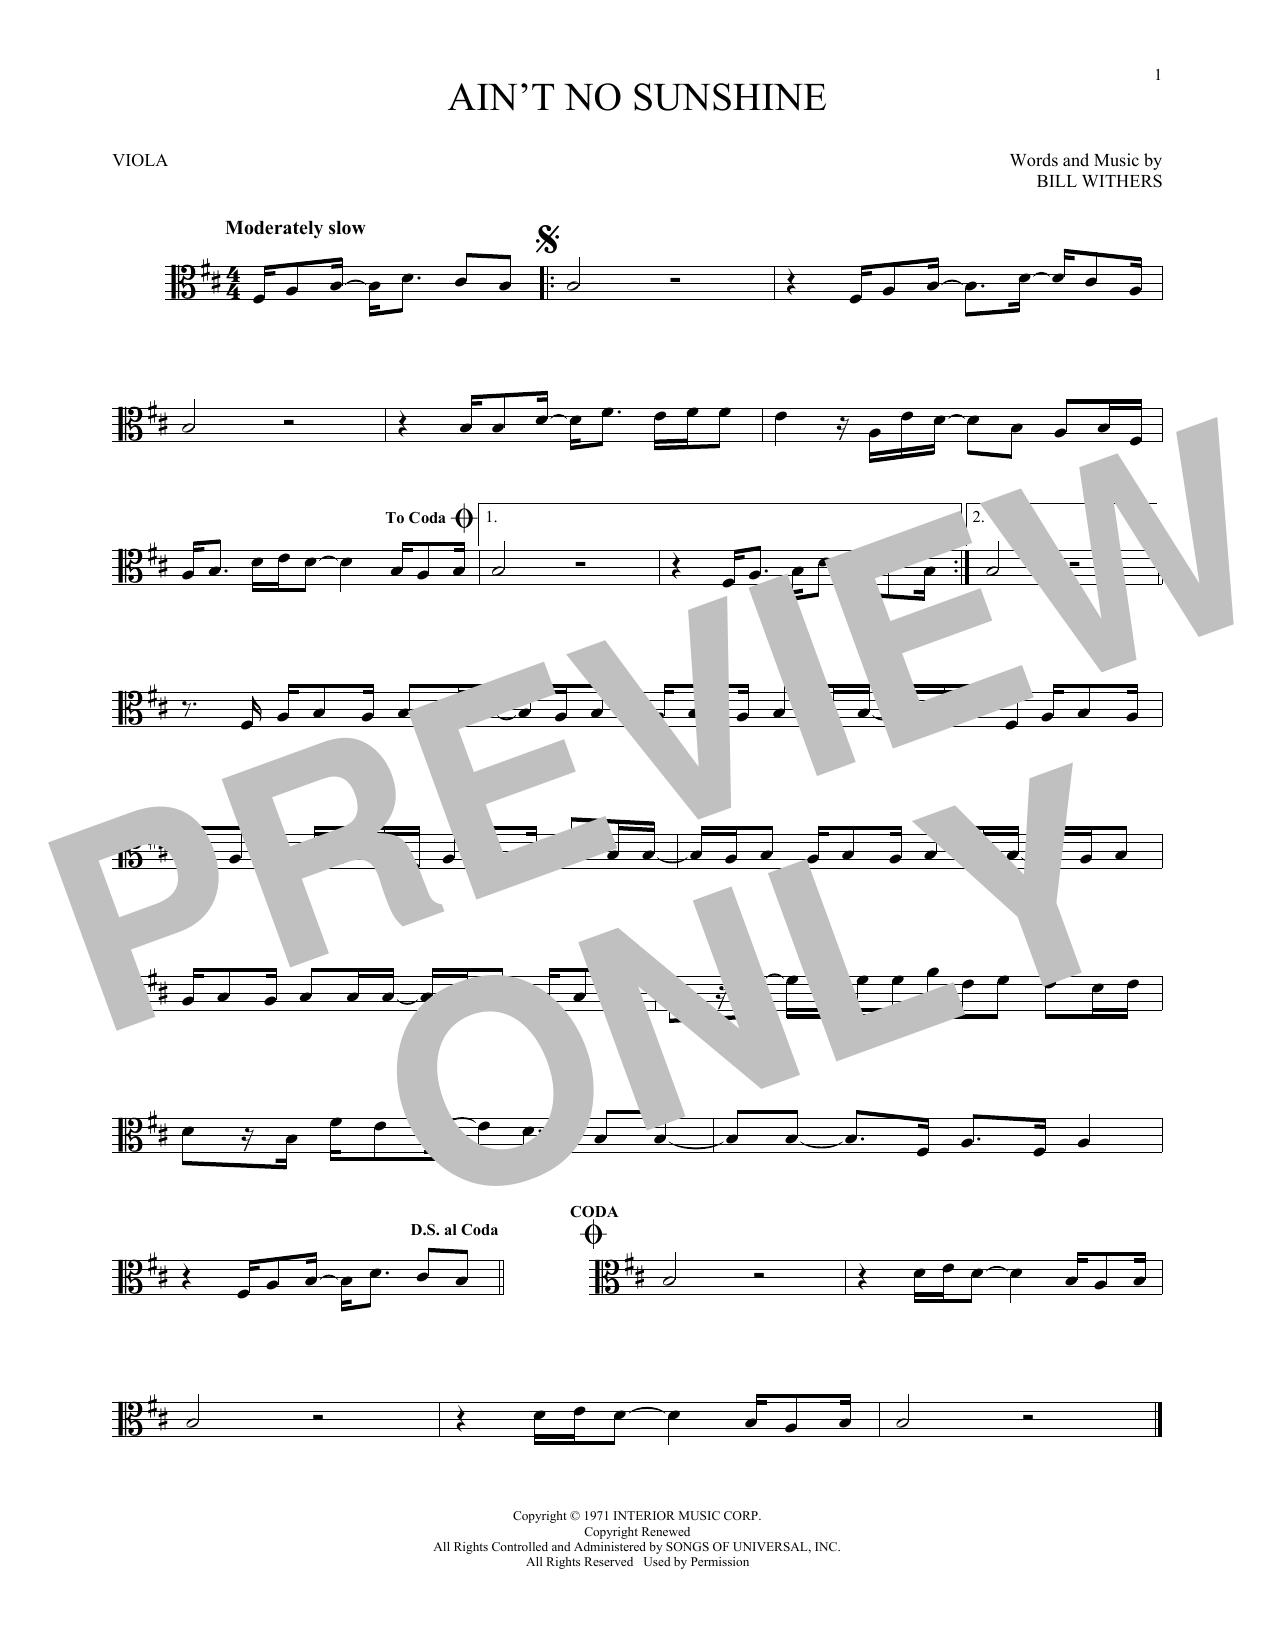 Ain T No Sunshine Chords Aint No Sunshine Bill Withers Hal Leonard Prima Music